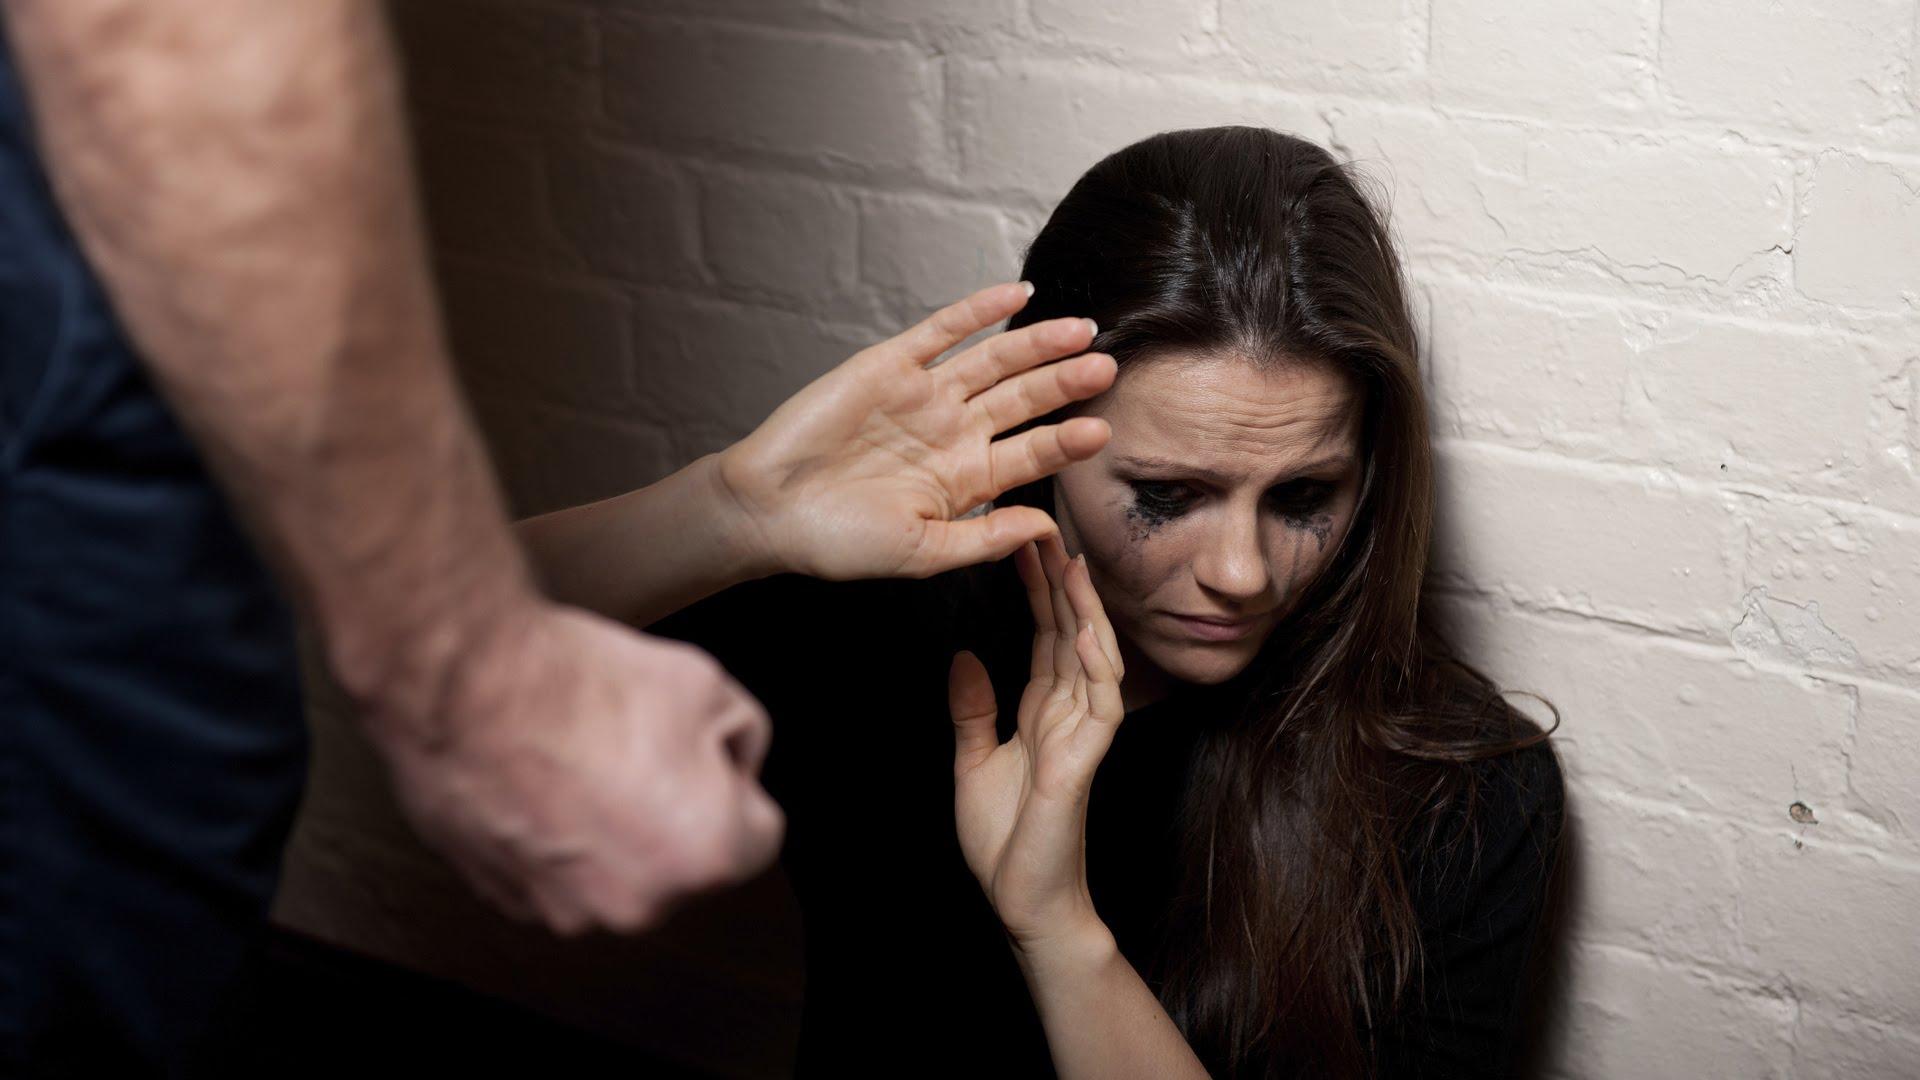 agressão a cônjuge